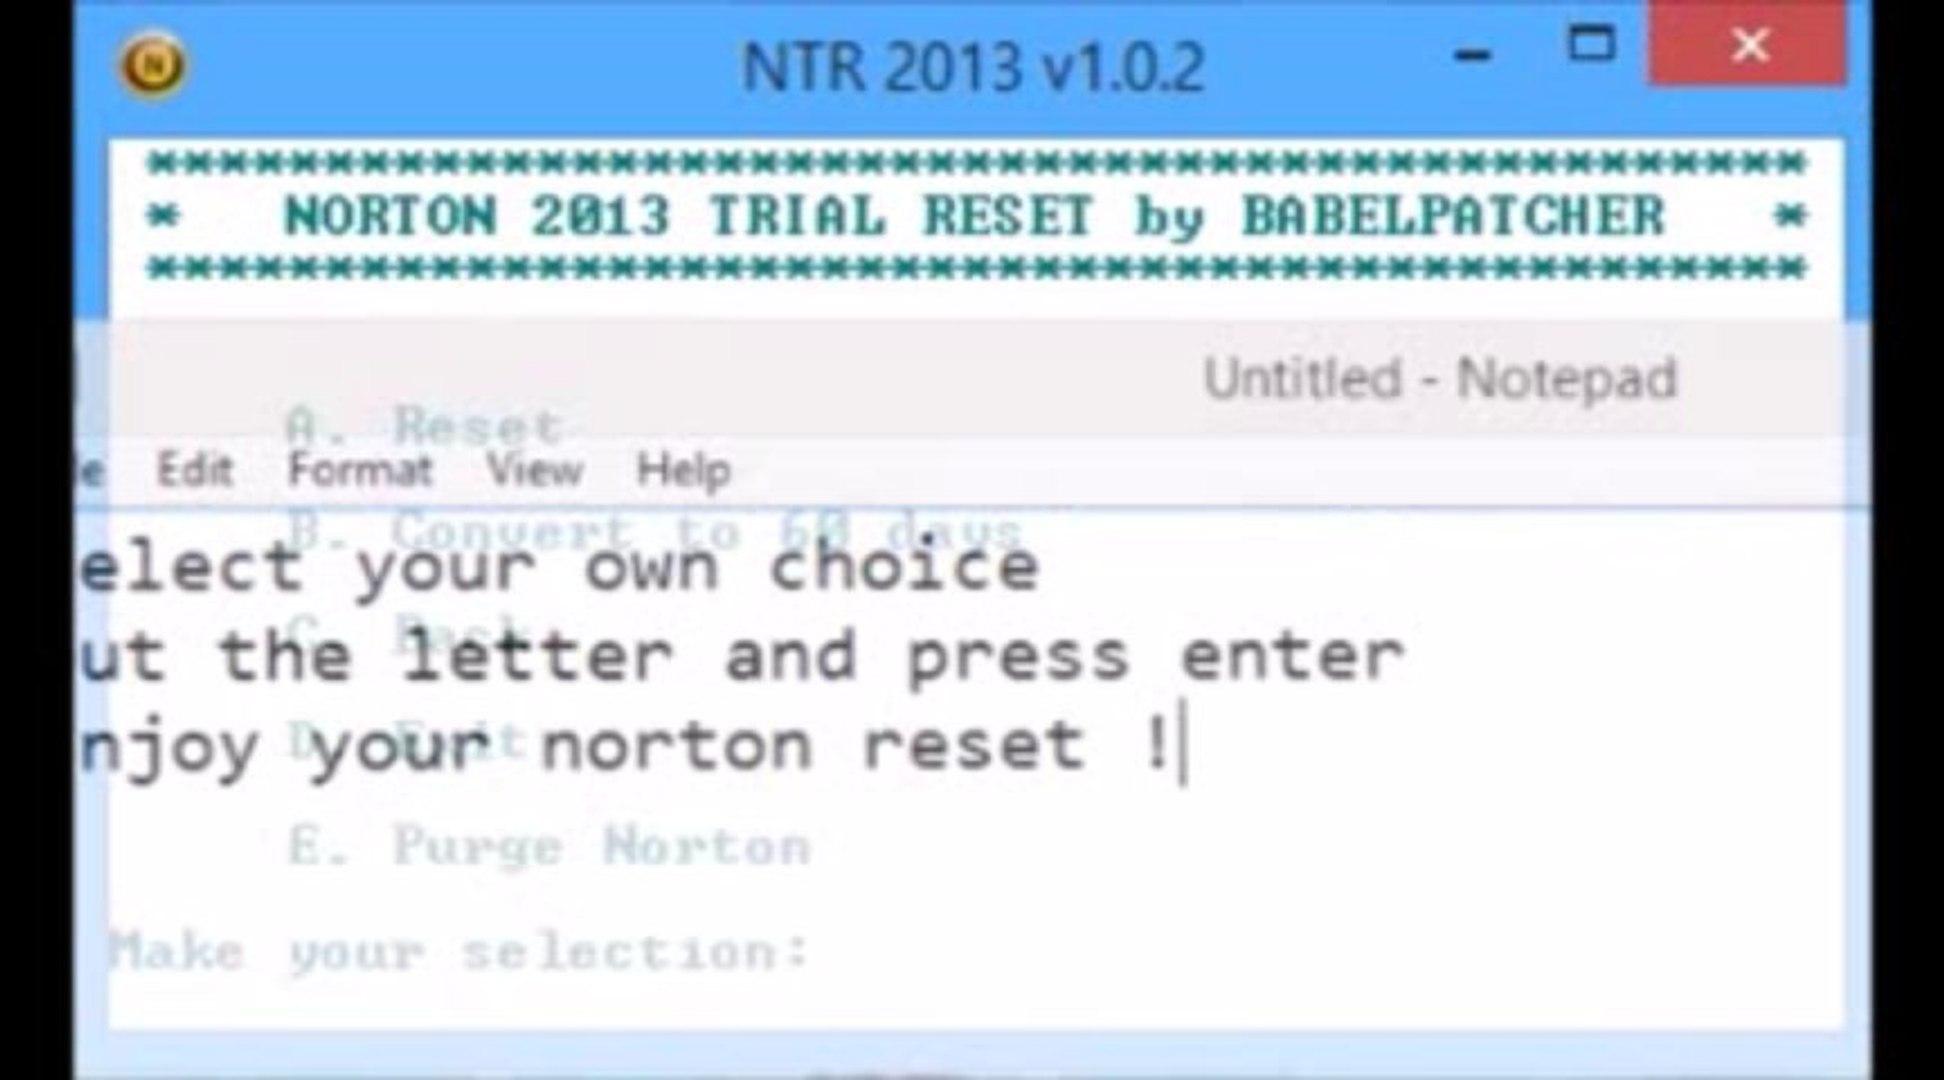 Norton 2013 Trial Reset v1 0 2 [2014 Updated]